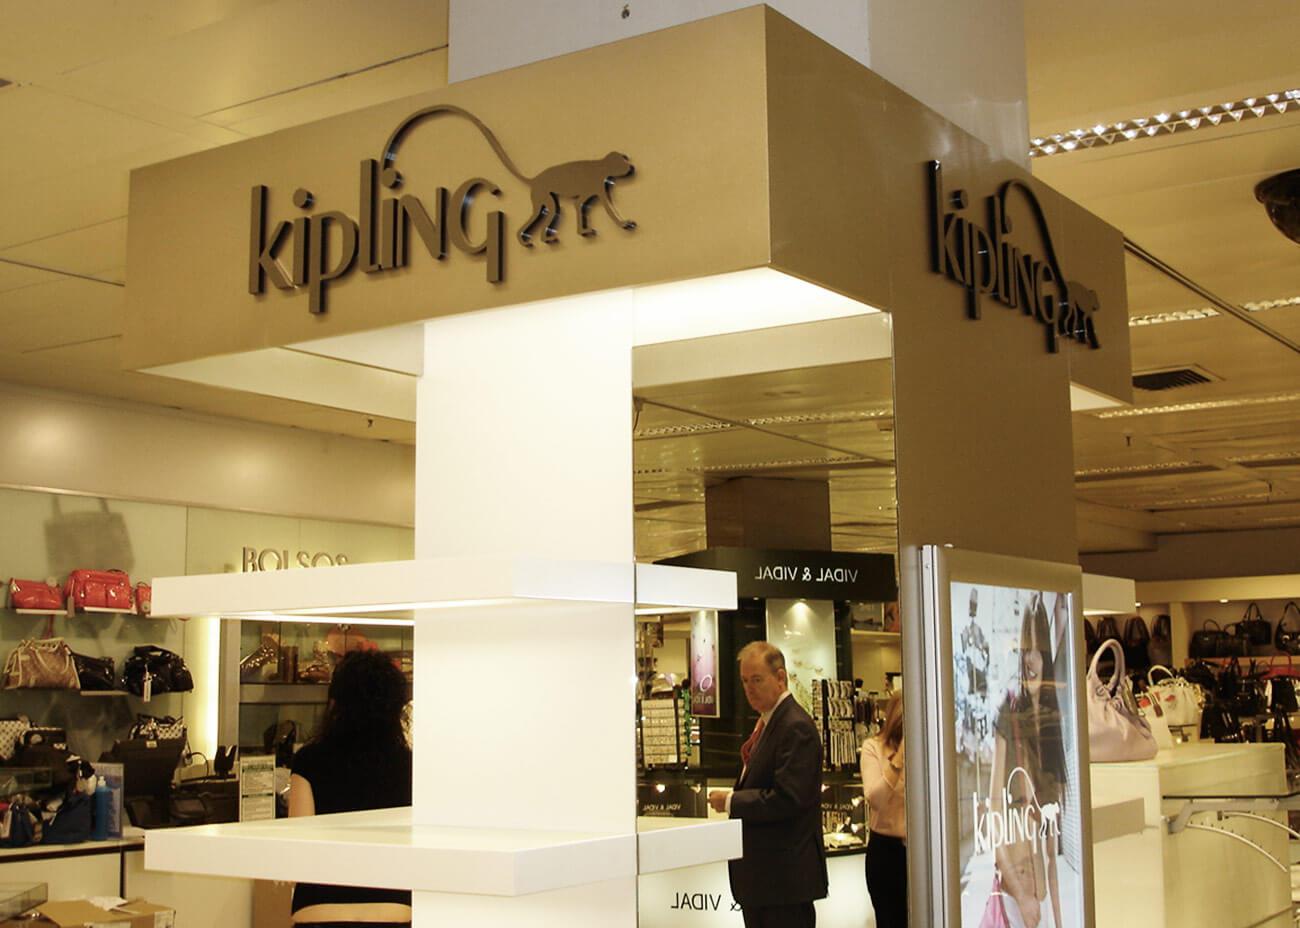 kipling-img02-caad-retail-design-barcelona-Recuperado